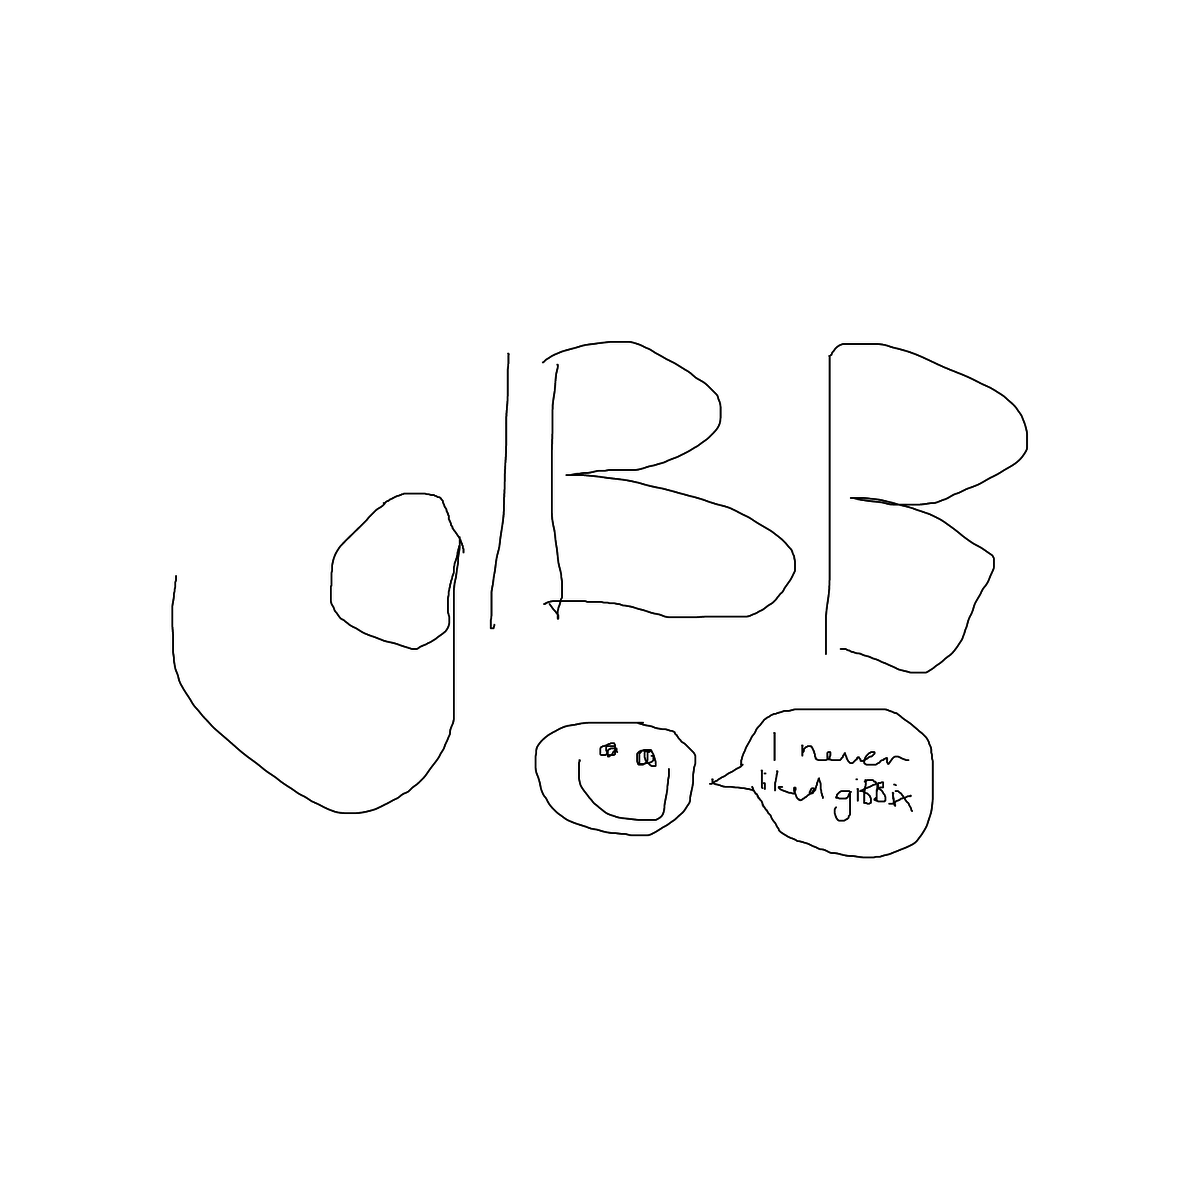 BAAAM drawing#8200 lat:46.9555282592773440lng: 7.4438190460205080